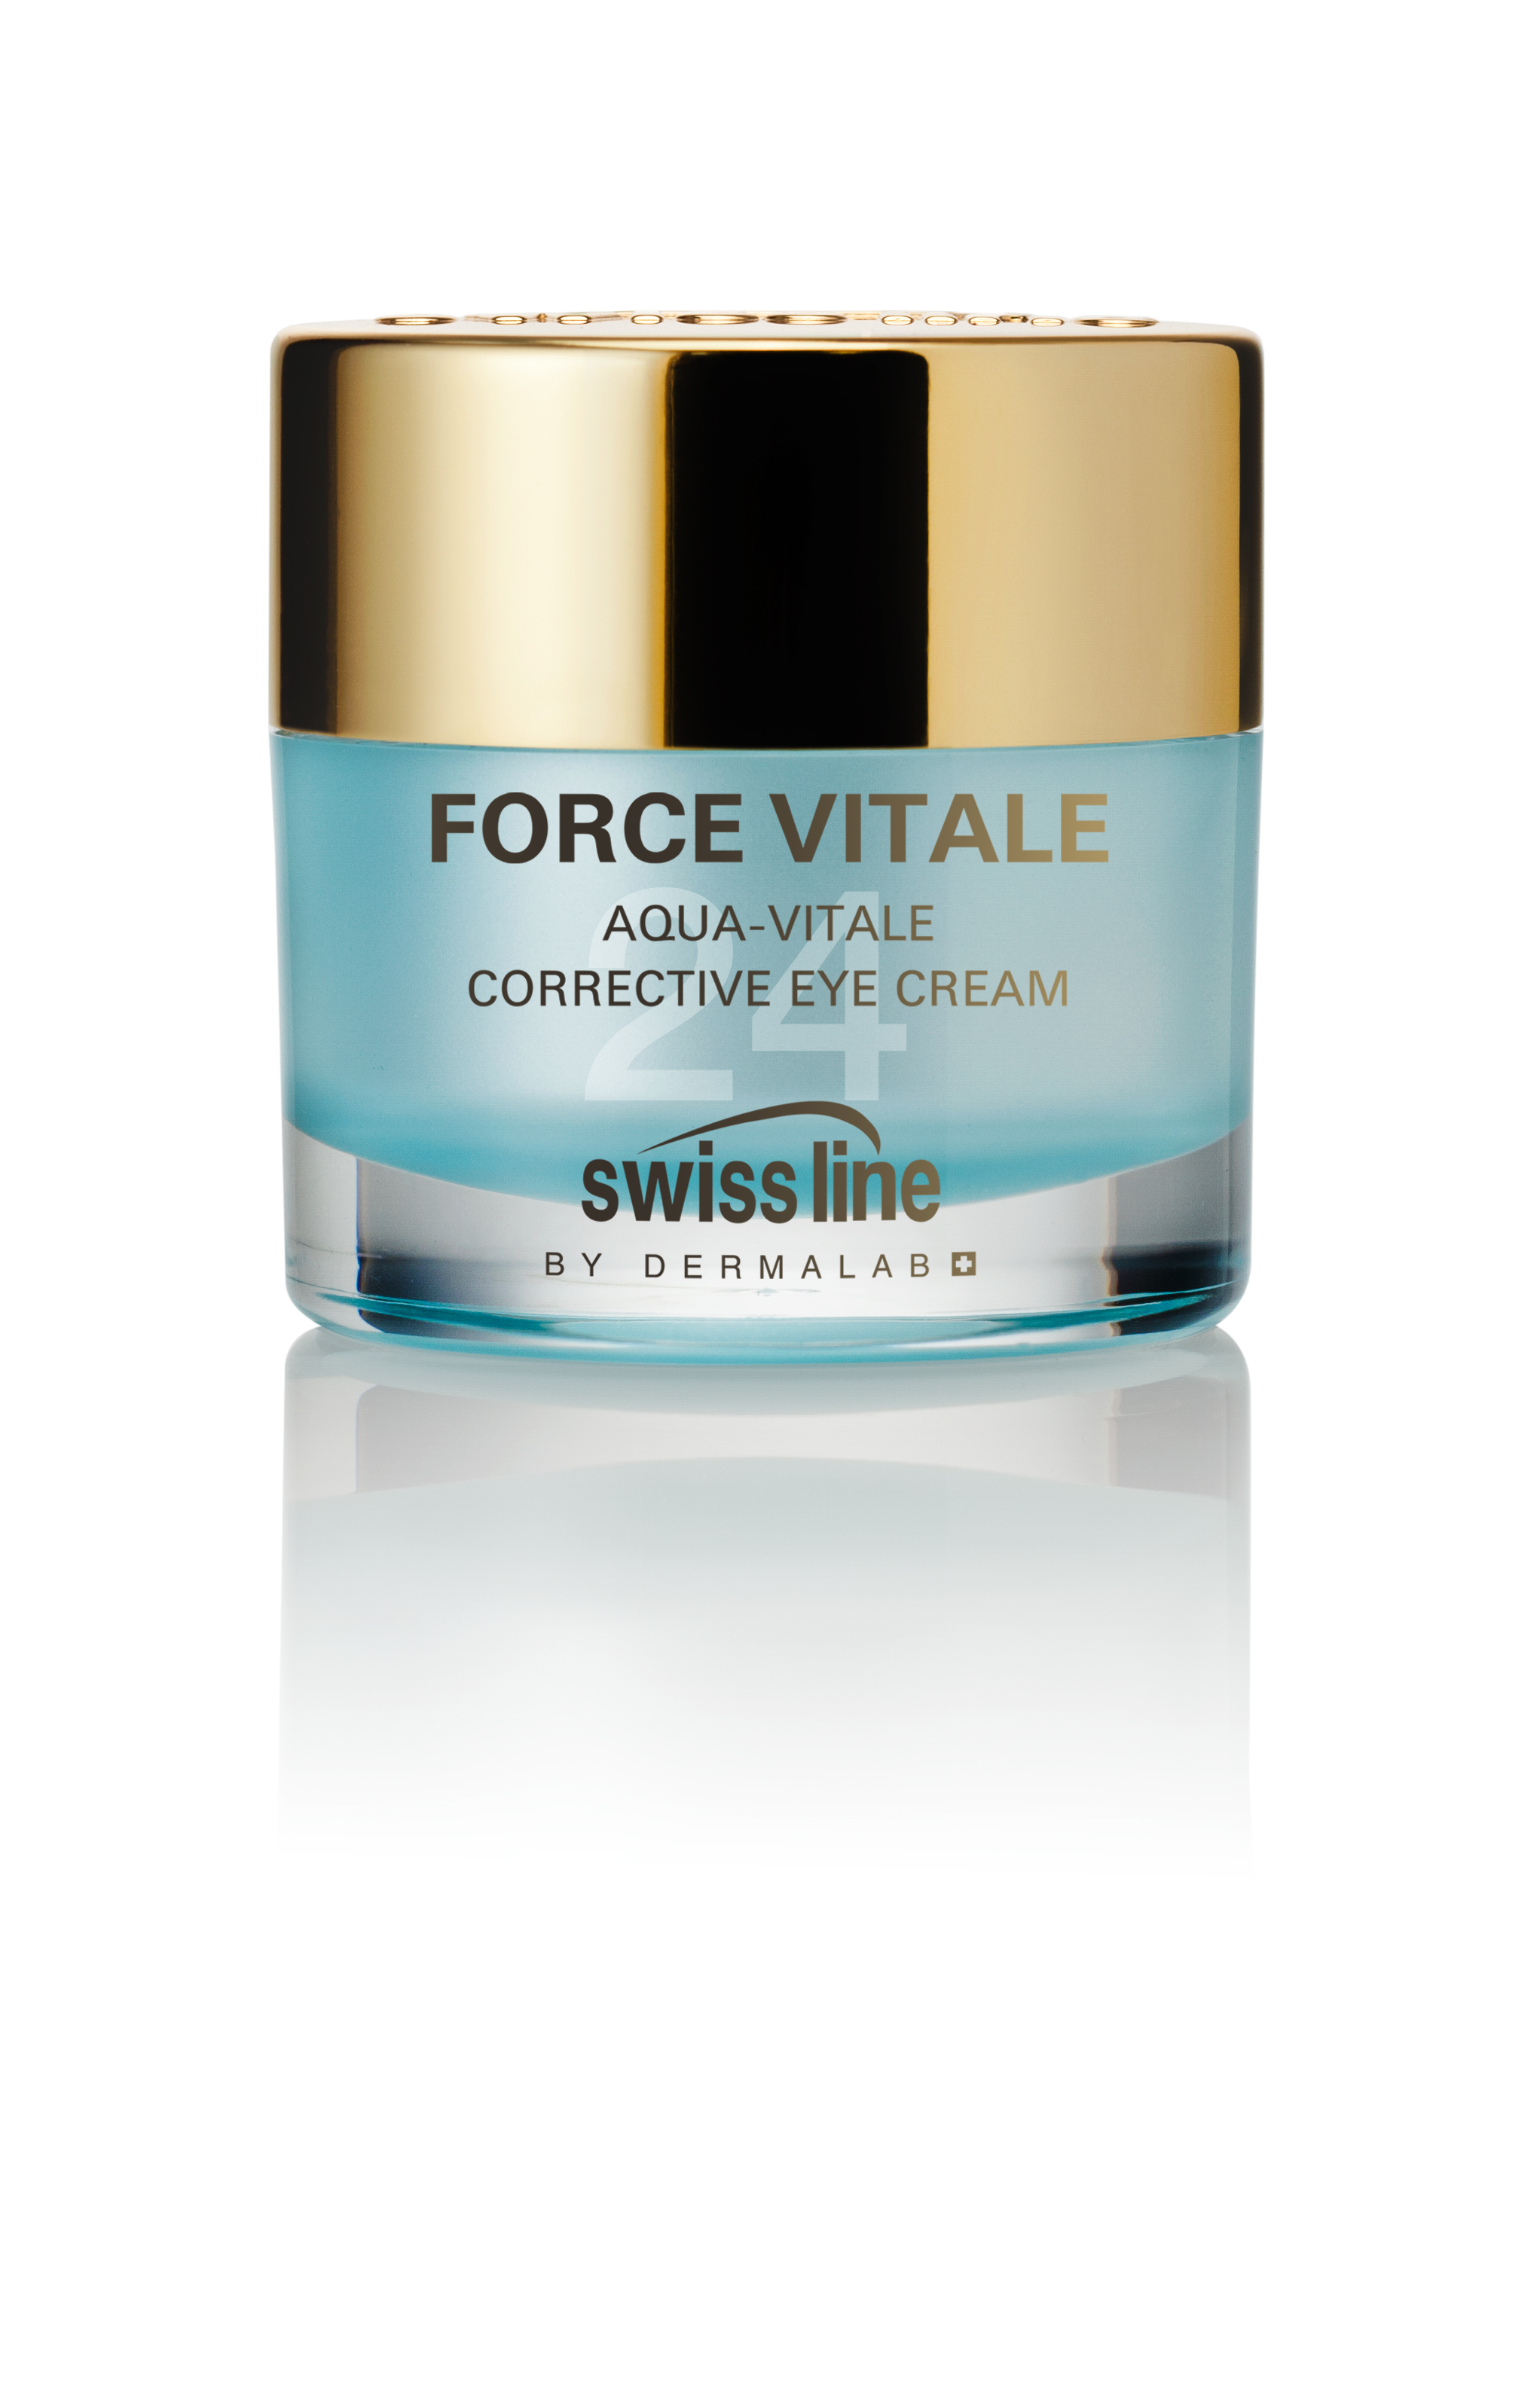 SWISS LINE Крем корректирующий для глаз Живая Вода / Aqua-Vitale Corrective Eye Cream 15 мл